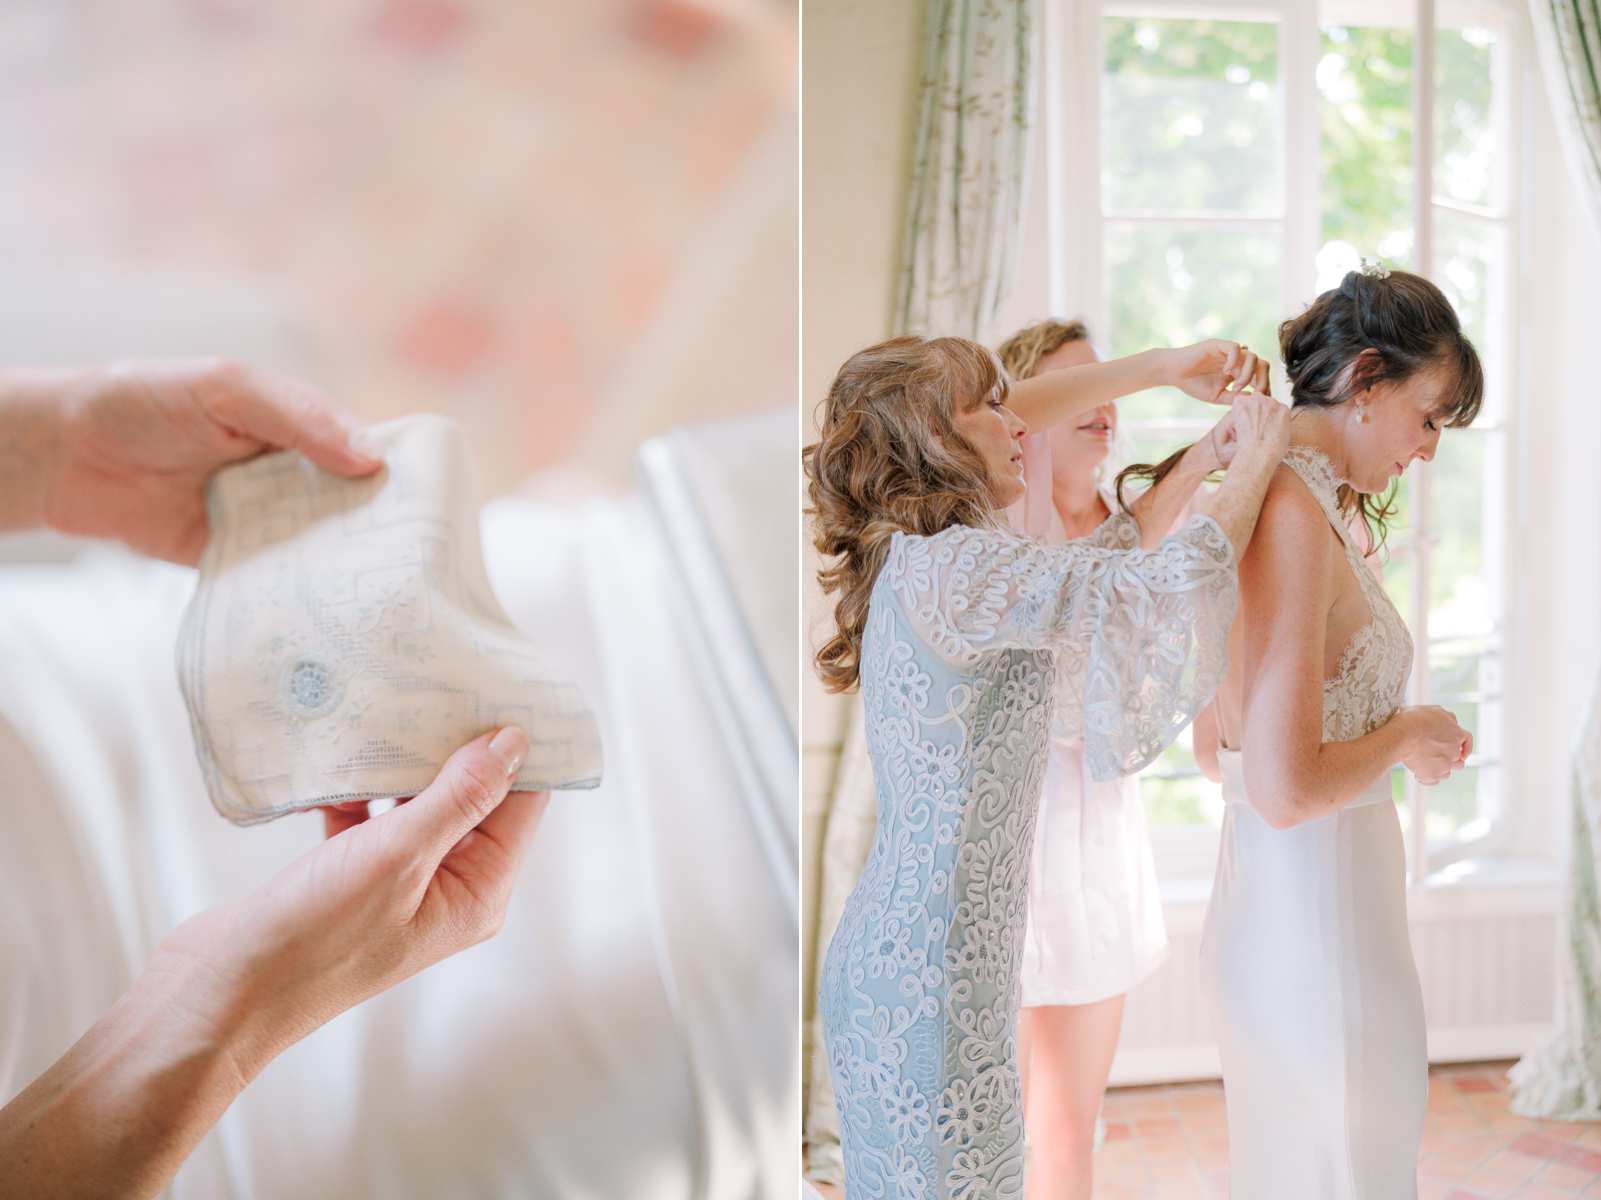 Boheme-Moon-Photography-Wedding-in-Provence-France_011.jpg